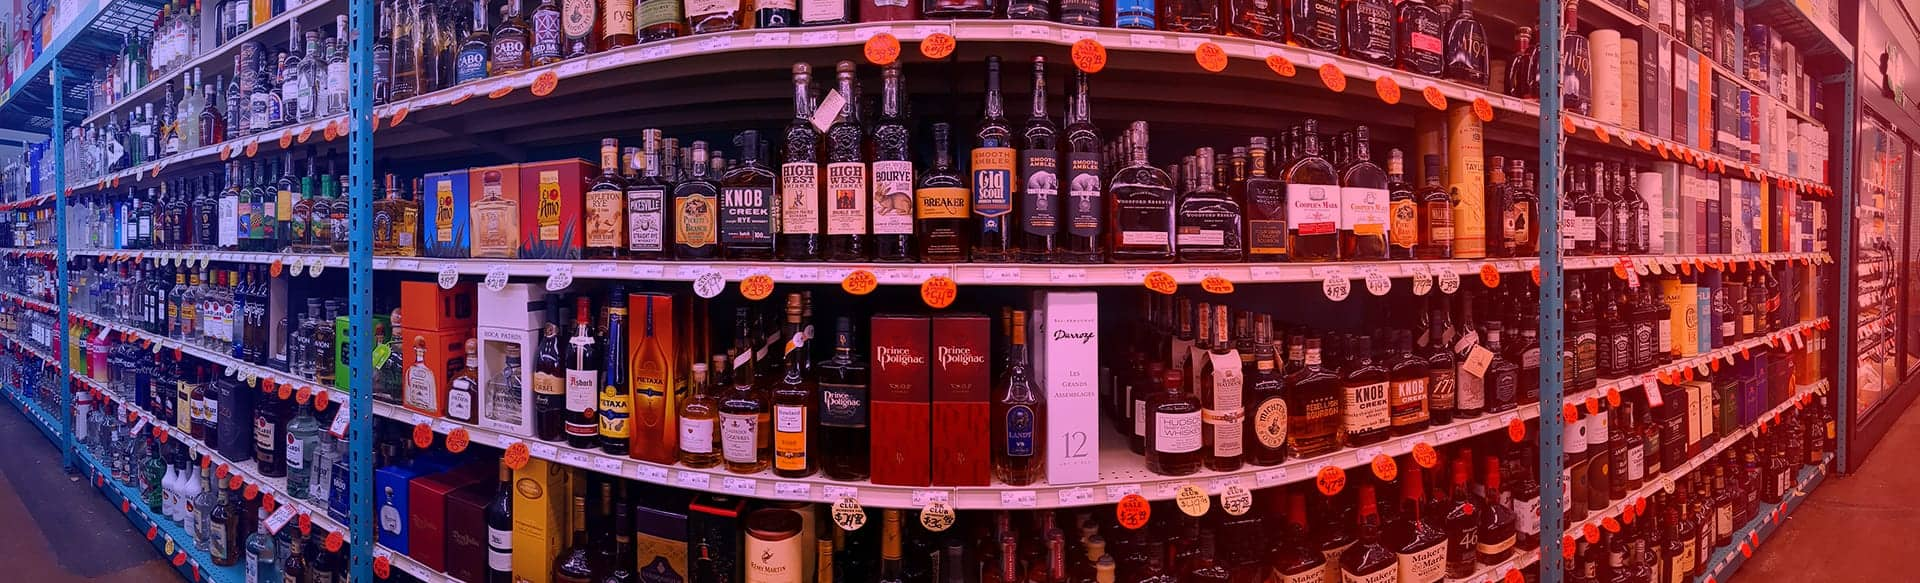 Liquor Store Insurance